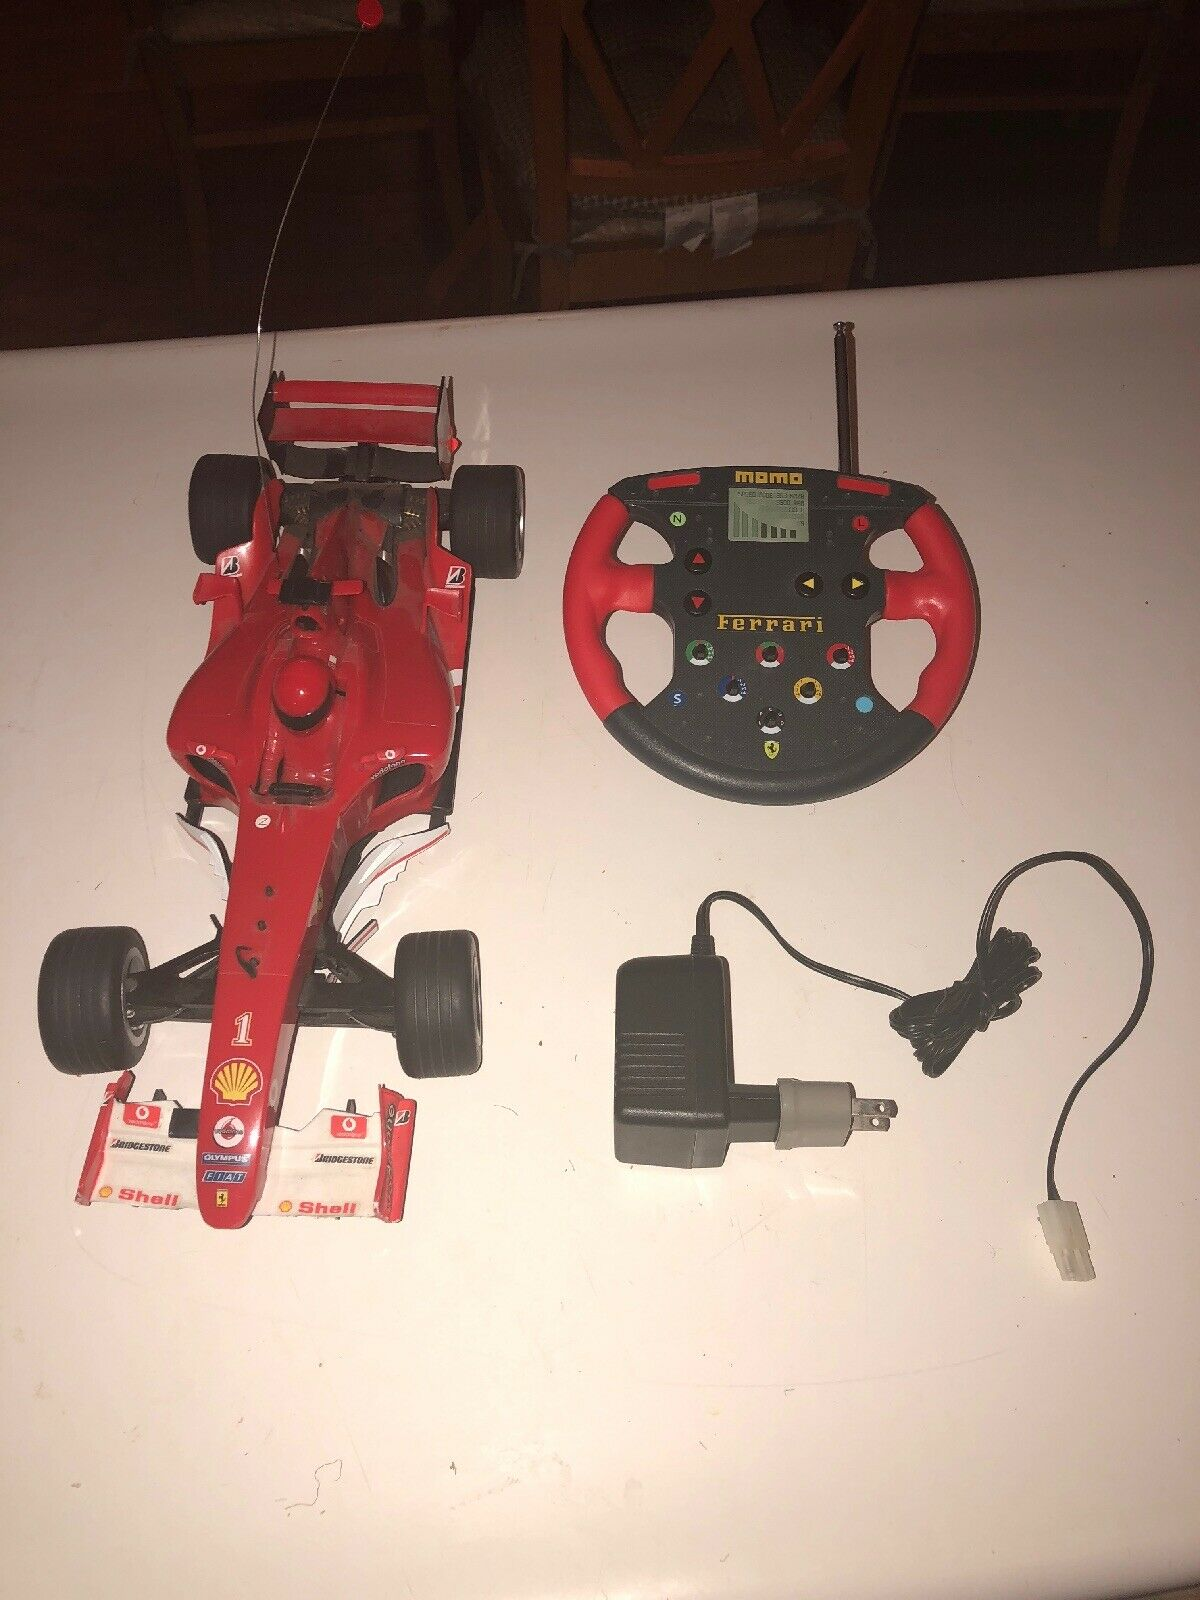 2004 RC MOMO Ferrari Evolution RARE RC Voiture w Chargeur 15 1 4  Long